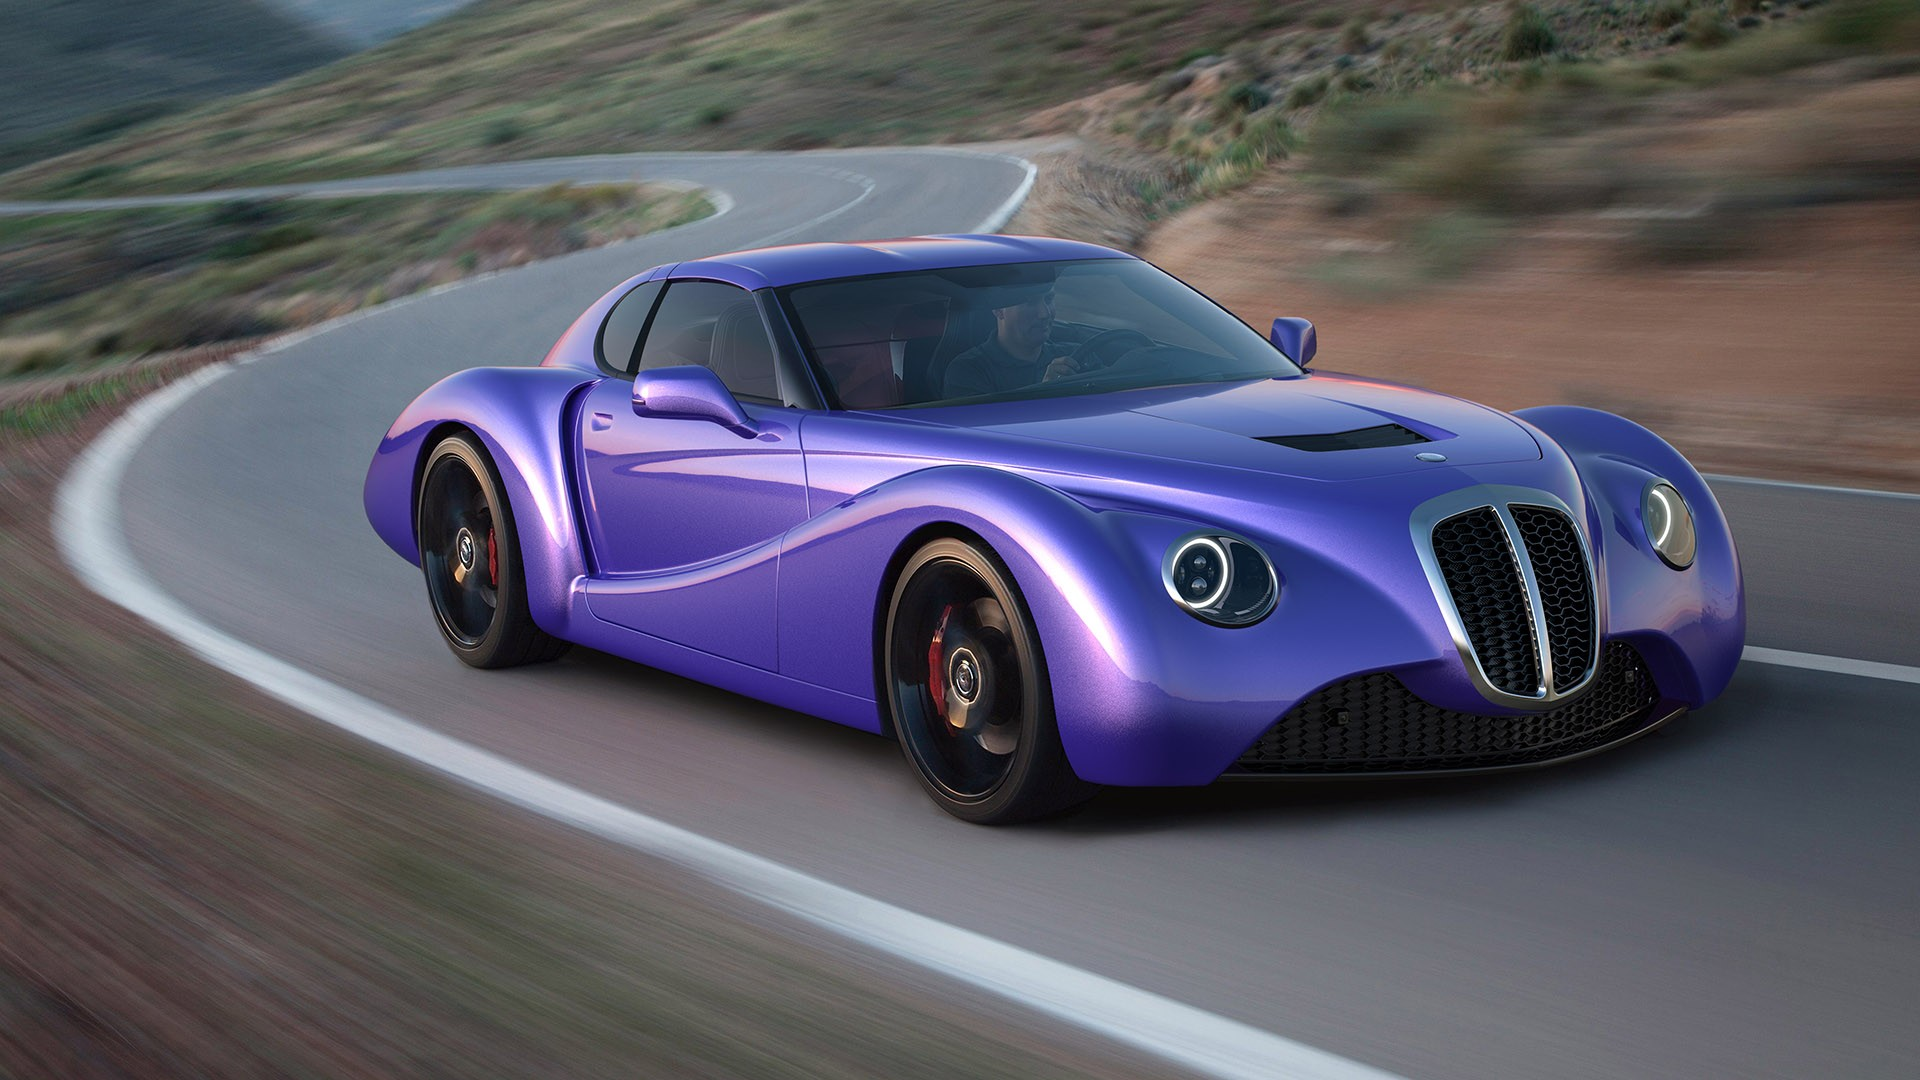 C7 Corvette-based Eadon Green Zeclat Lands In Geneva With British Styling - autoevolution